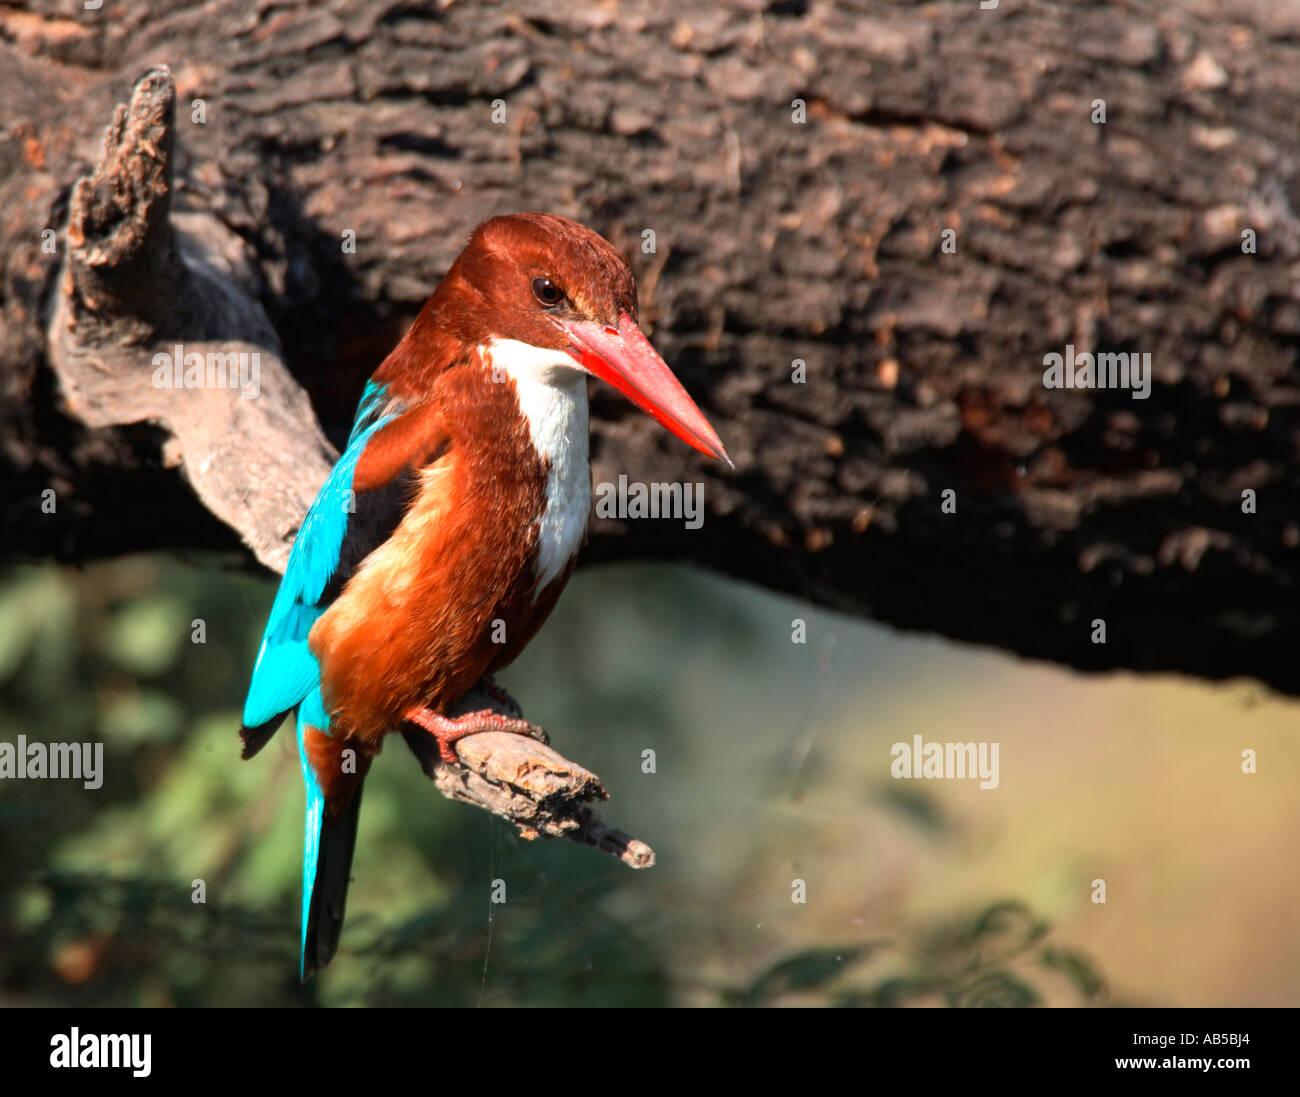 India,  Bharatpur, Keloadeo Ghana national park,  white breasted kingfisher,  birds - Stock Image